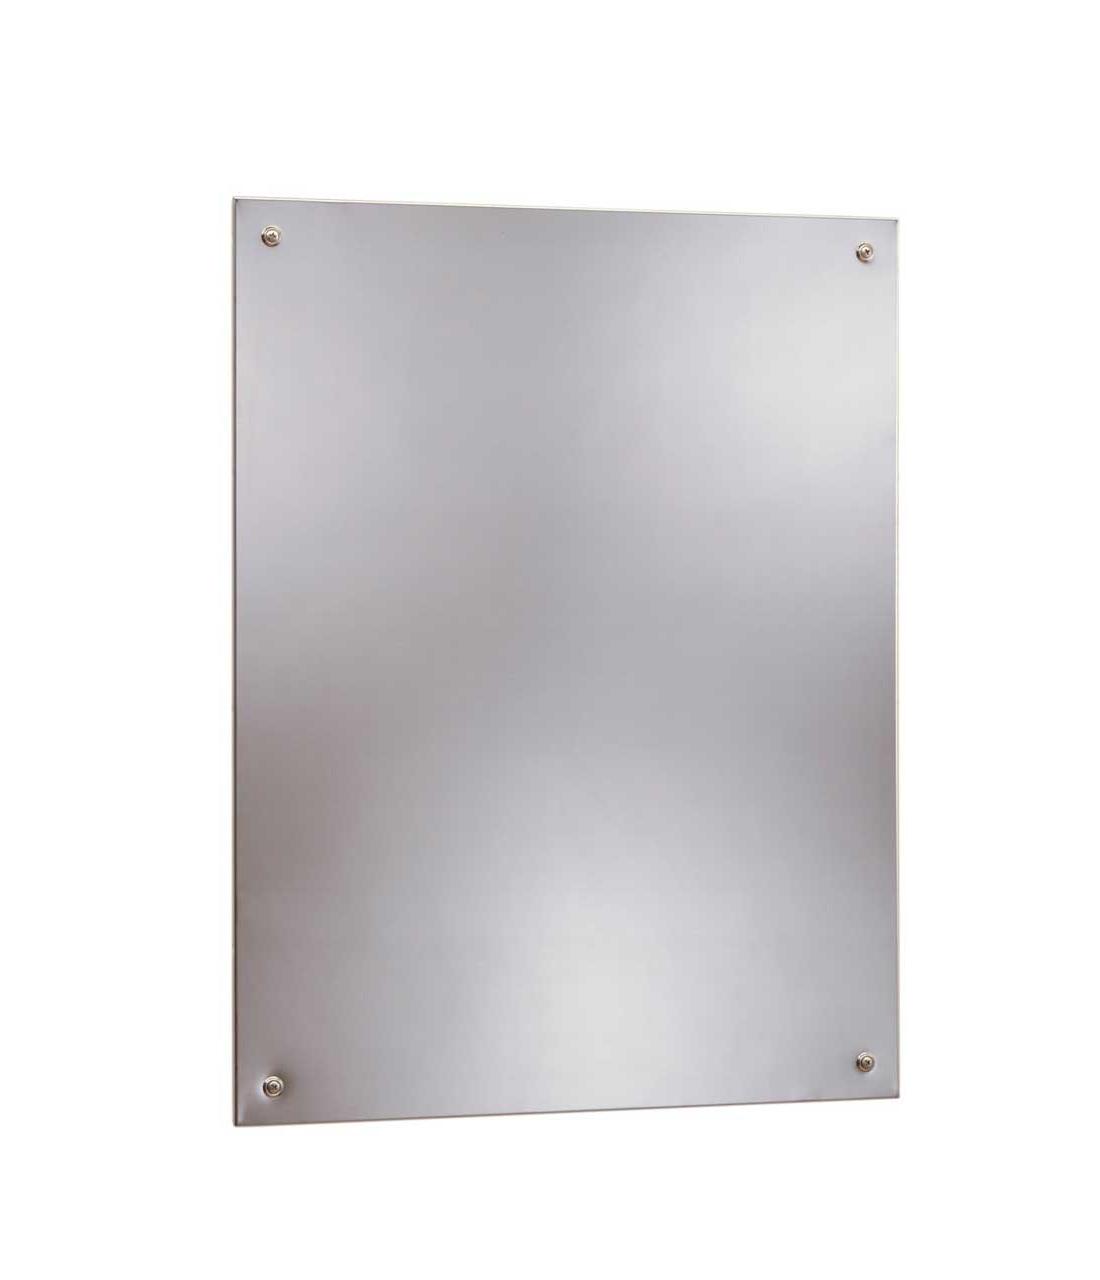 Interior Wall Mirror Full Length Frameless Frameless Full With Regard To Wall Mirror Without Frame (Image 6 of 15)